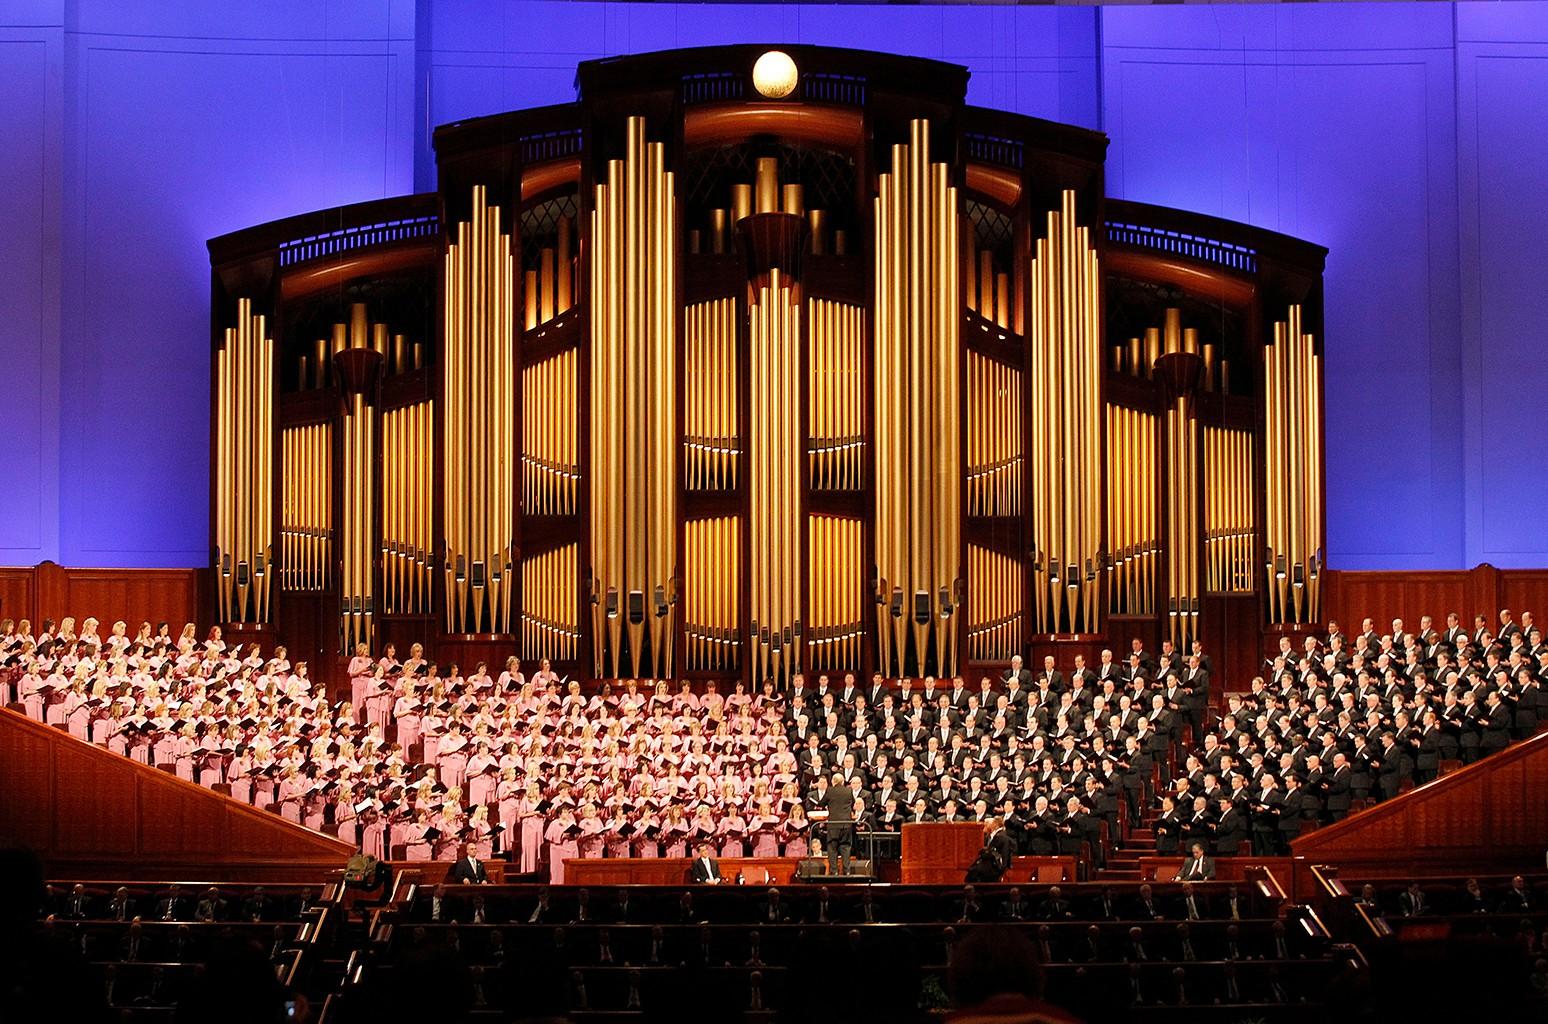 2021 Mormon Tabernacle Choir Christmas Concert Mormon Tabernacle Choir Changes Name As Church Shifts Away From Mormon Label Billboard Billboard